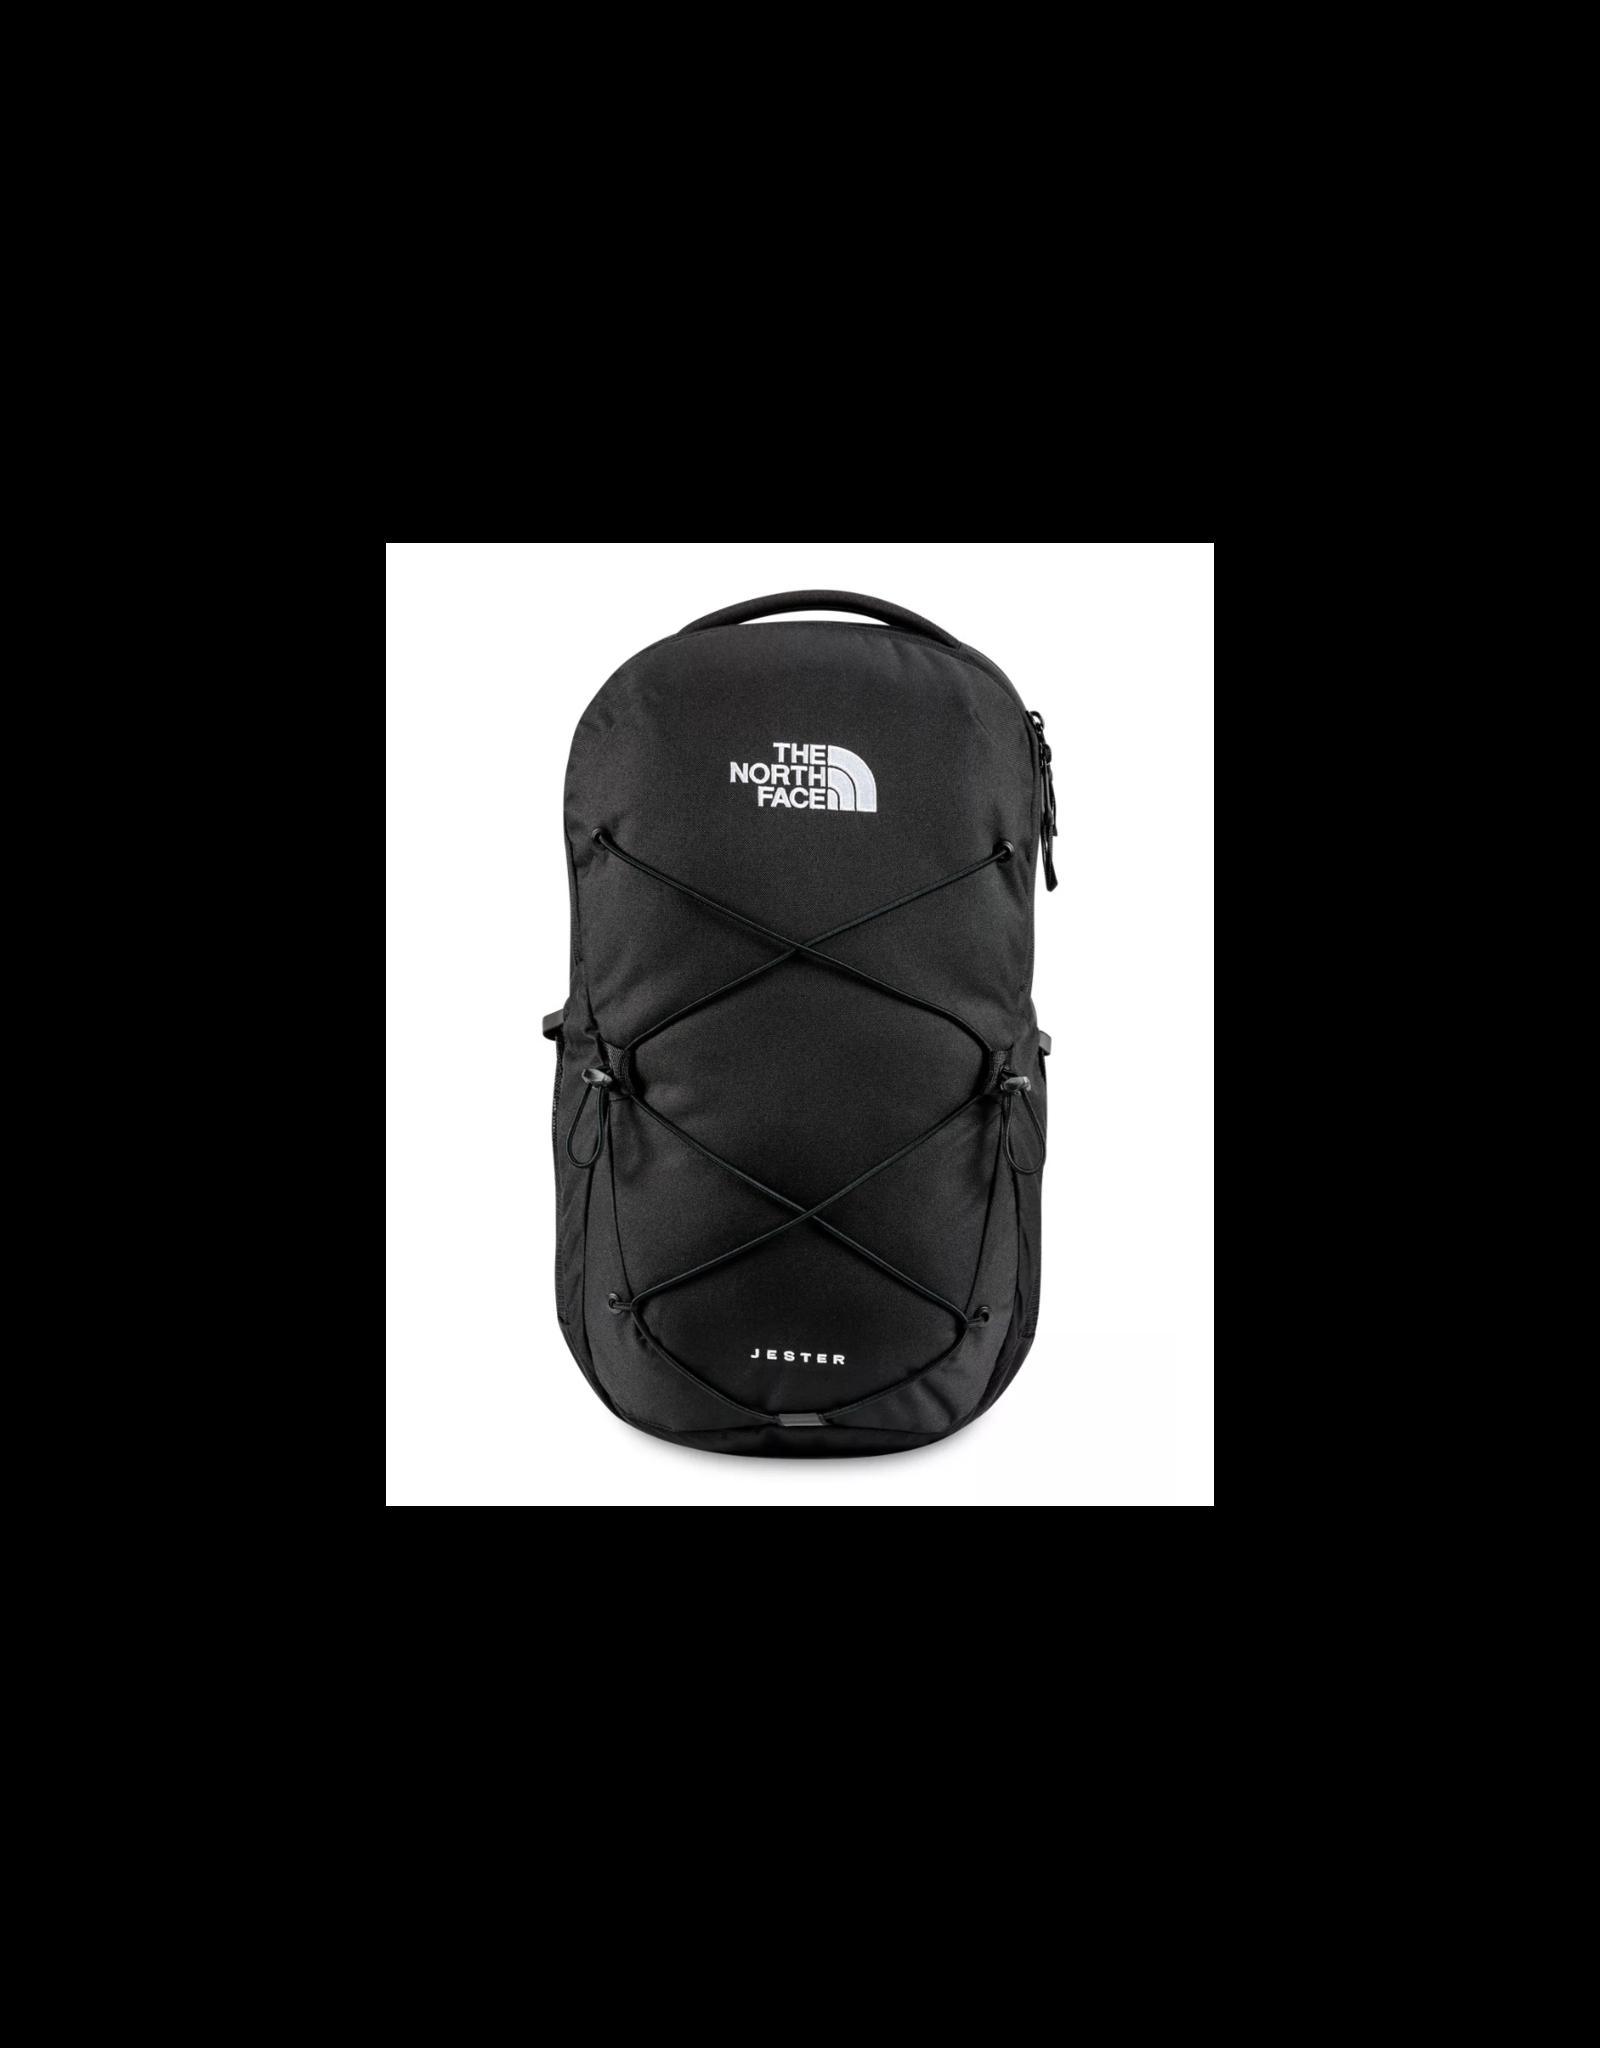 North Face North Face Jester Backpack JK3 TNF Black